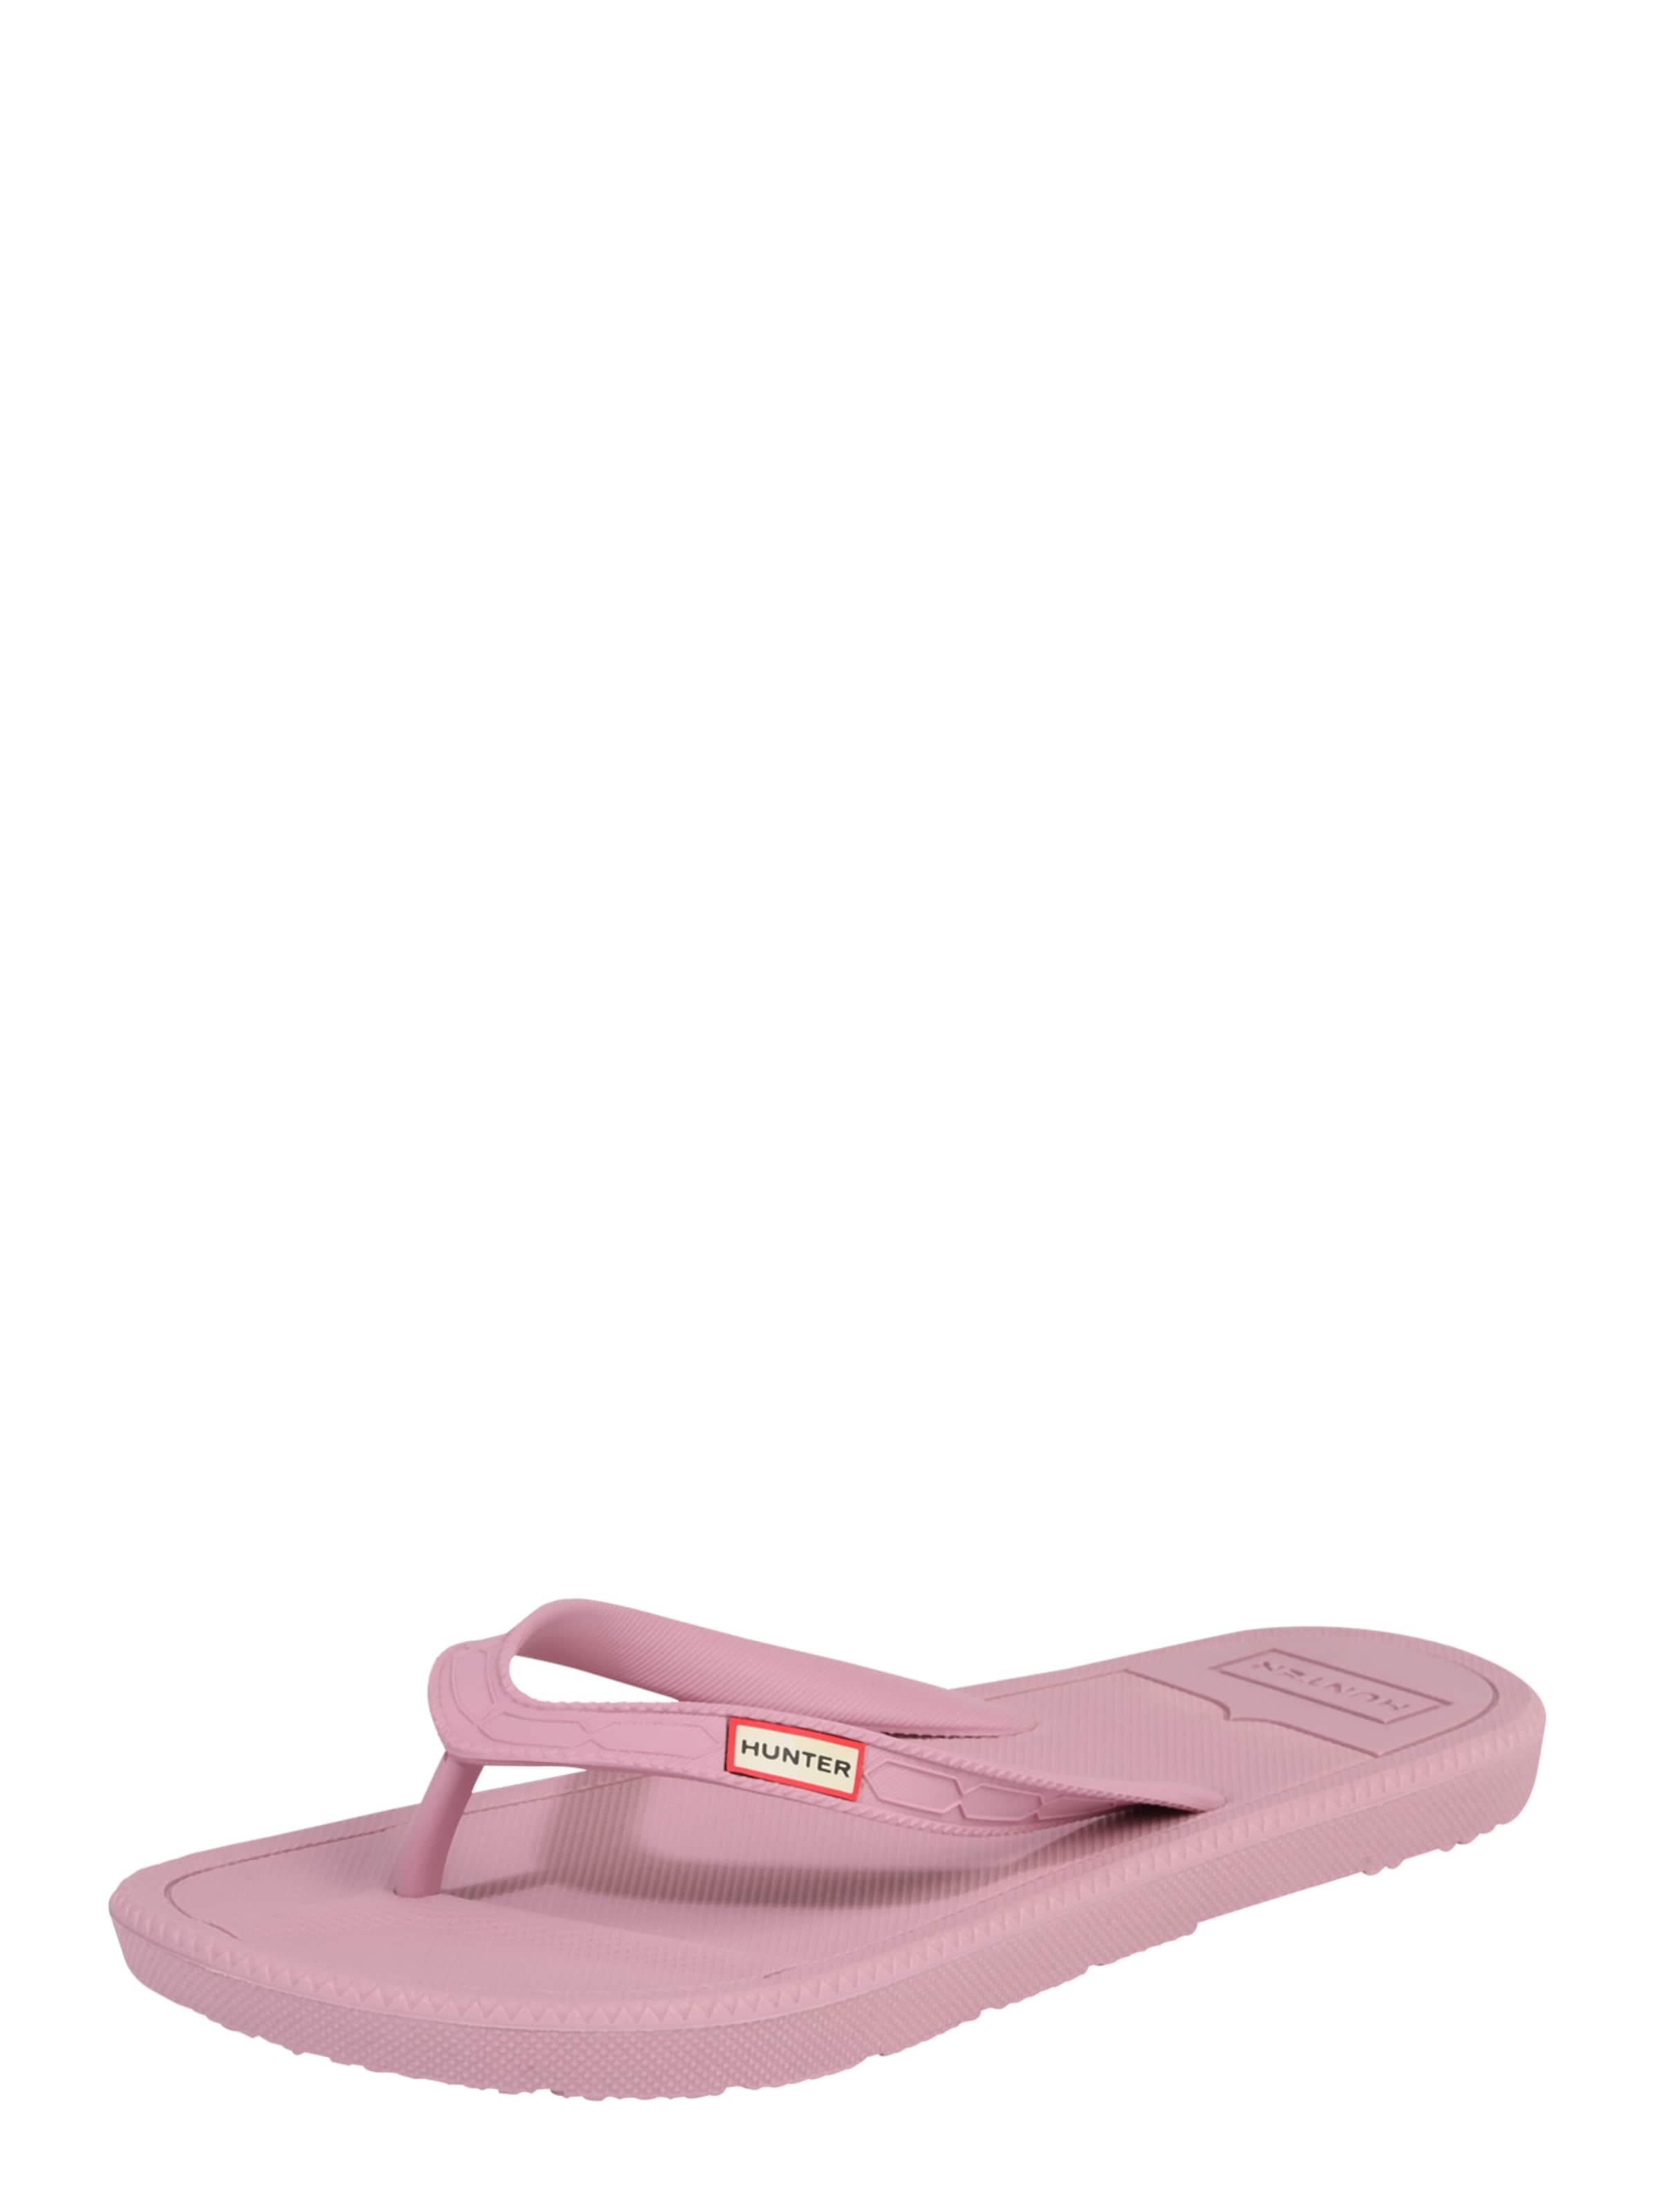 Haltbare Mode billige Schuhe Logo HUNTER | Zehentrennersandale mit Logo Schuhe Schuhe Gut getragene Schuhe 1ff413